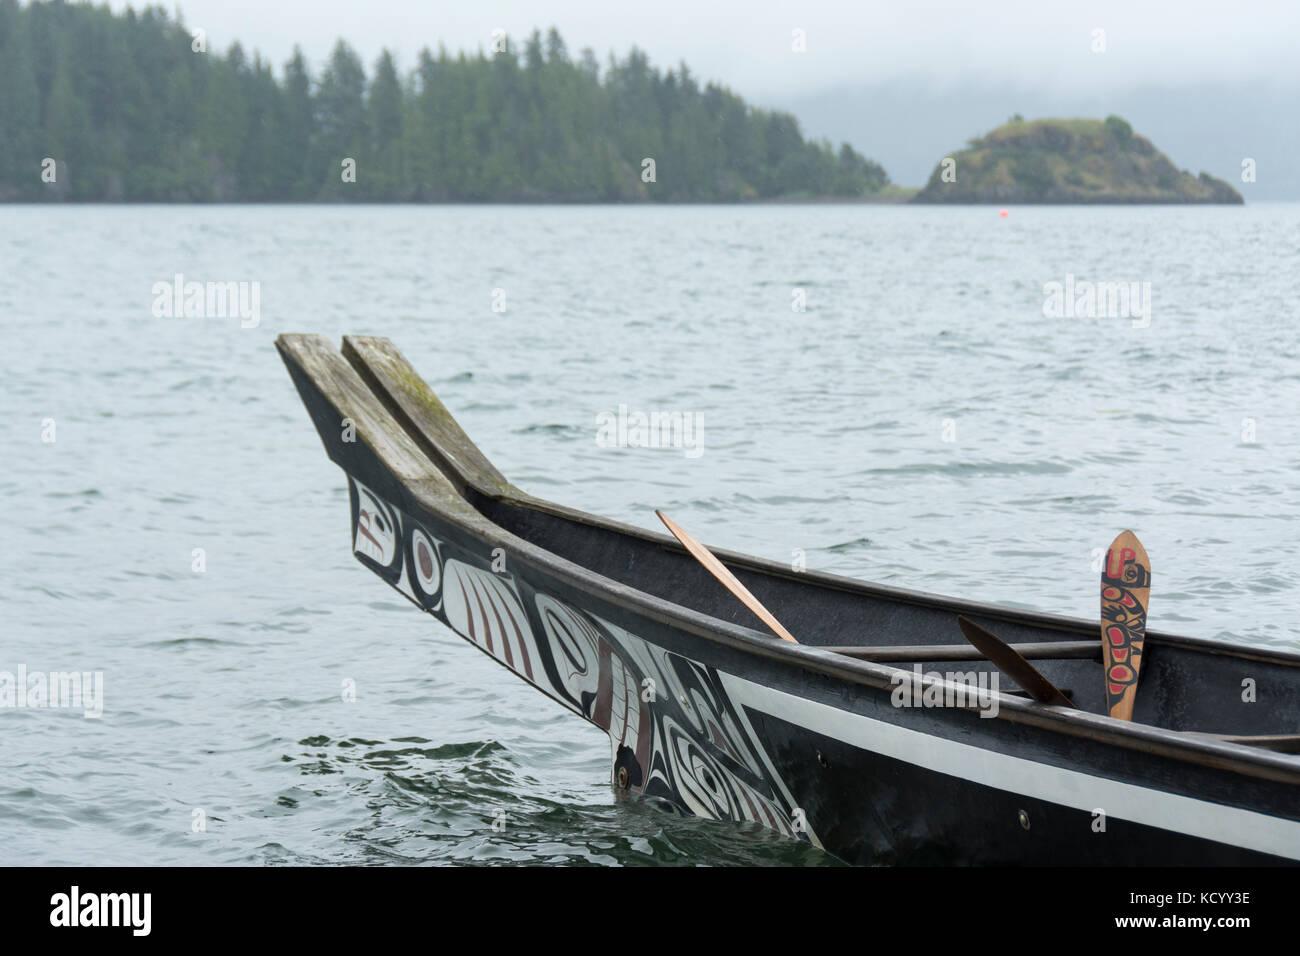 Loo Plex at Skidegate, replica of the Bill Reid cedar canoe, Lootaas, Wave Eater, Haida Gwaii, formerly known as - Stock Image